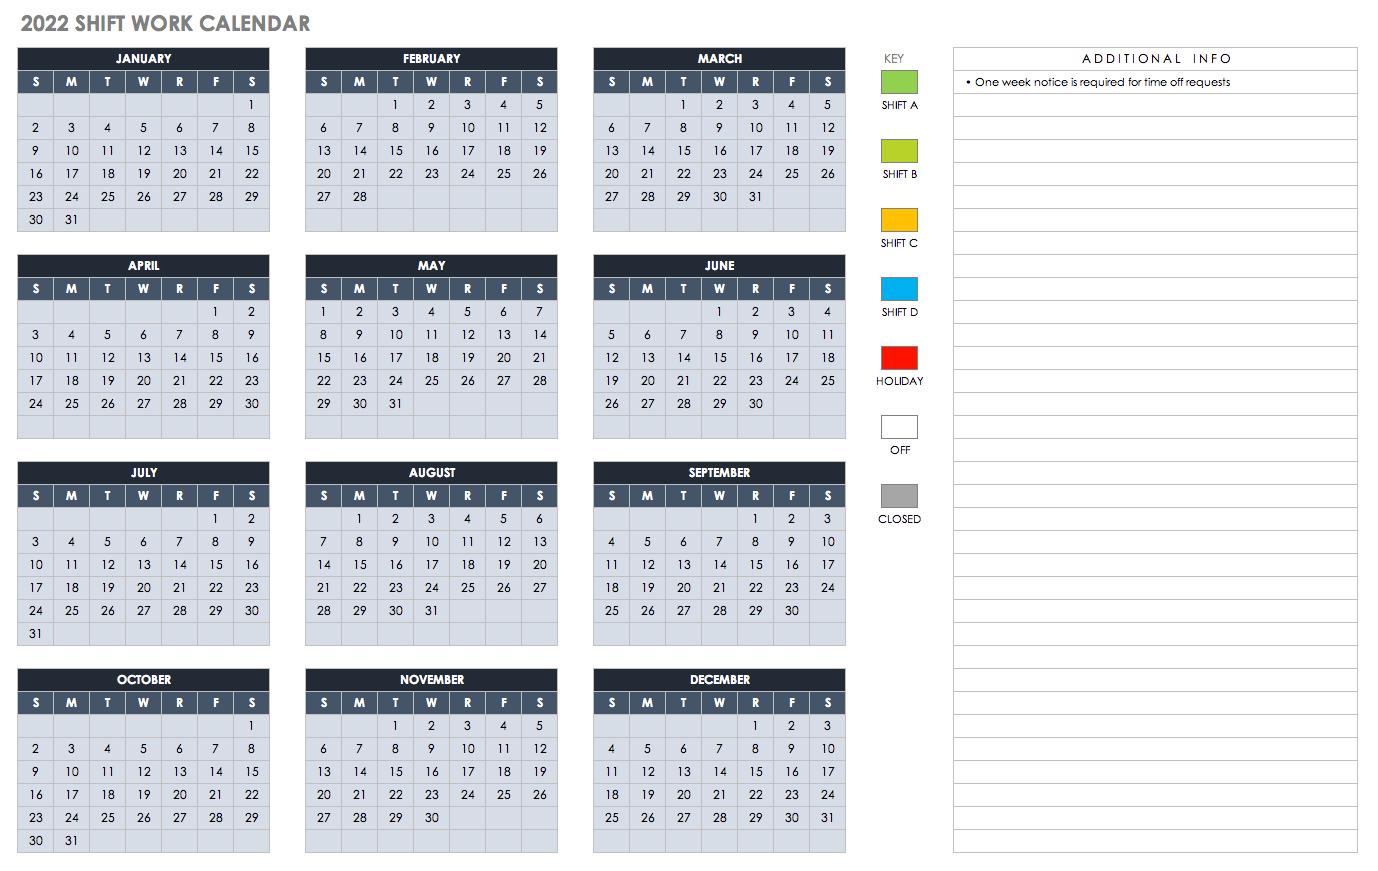 15 Free Monthly Calendar Templates | Smartsheet inside Shift Calendar 2021